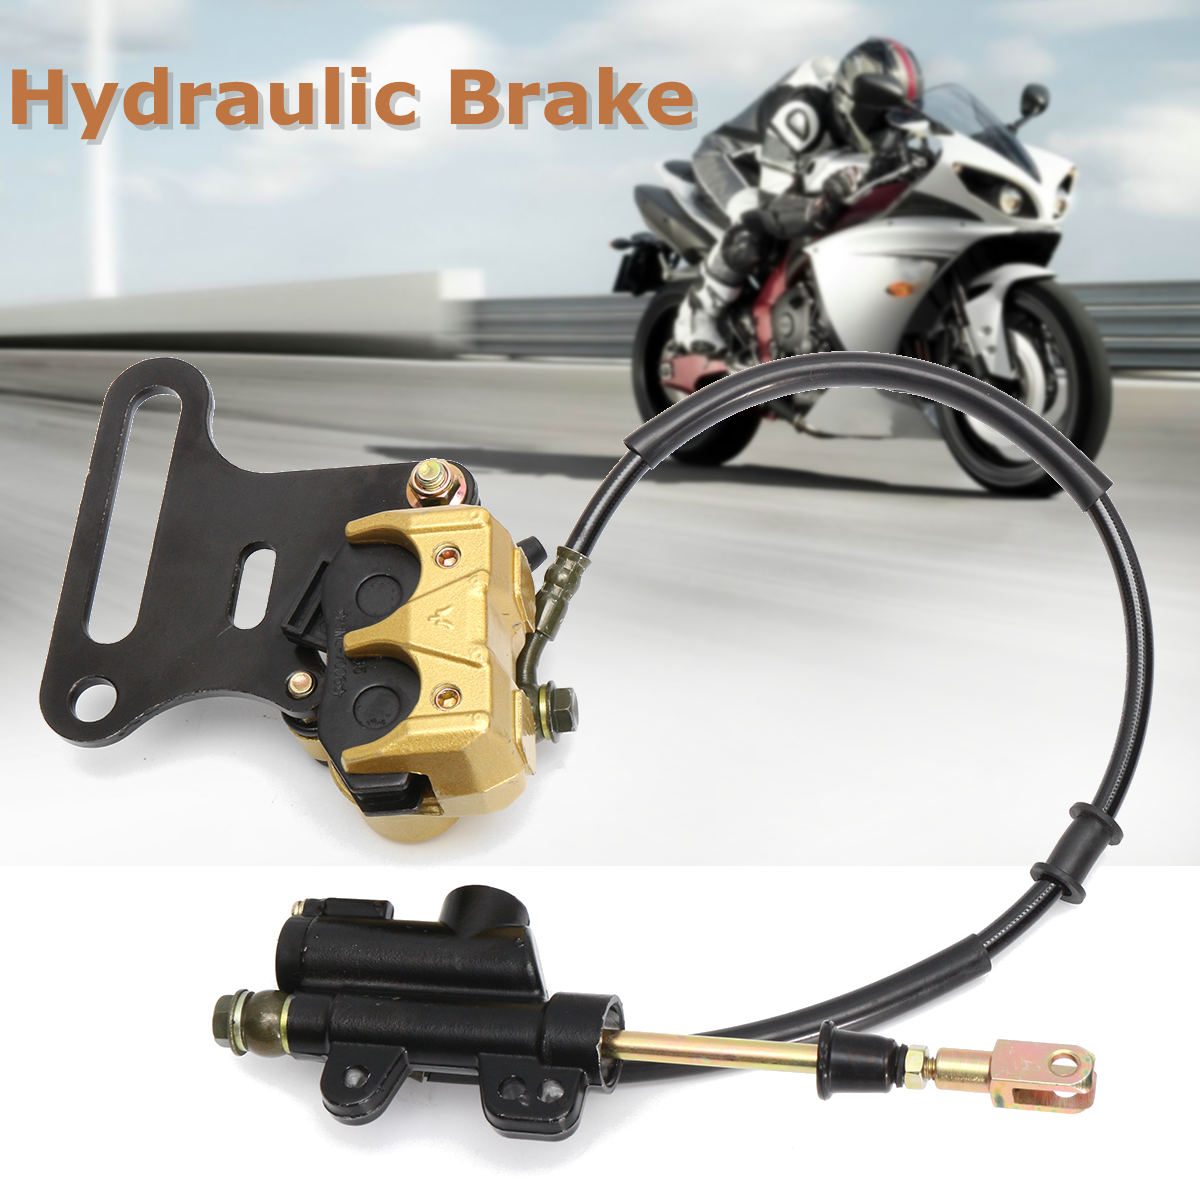 Hydraulic Rear Disc Brake Caliper System 110 125cc 140cc PIT PRO Dirt Bike 12mm tektro 300 hydraulic disc brake